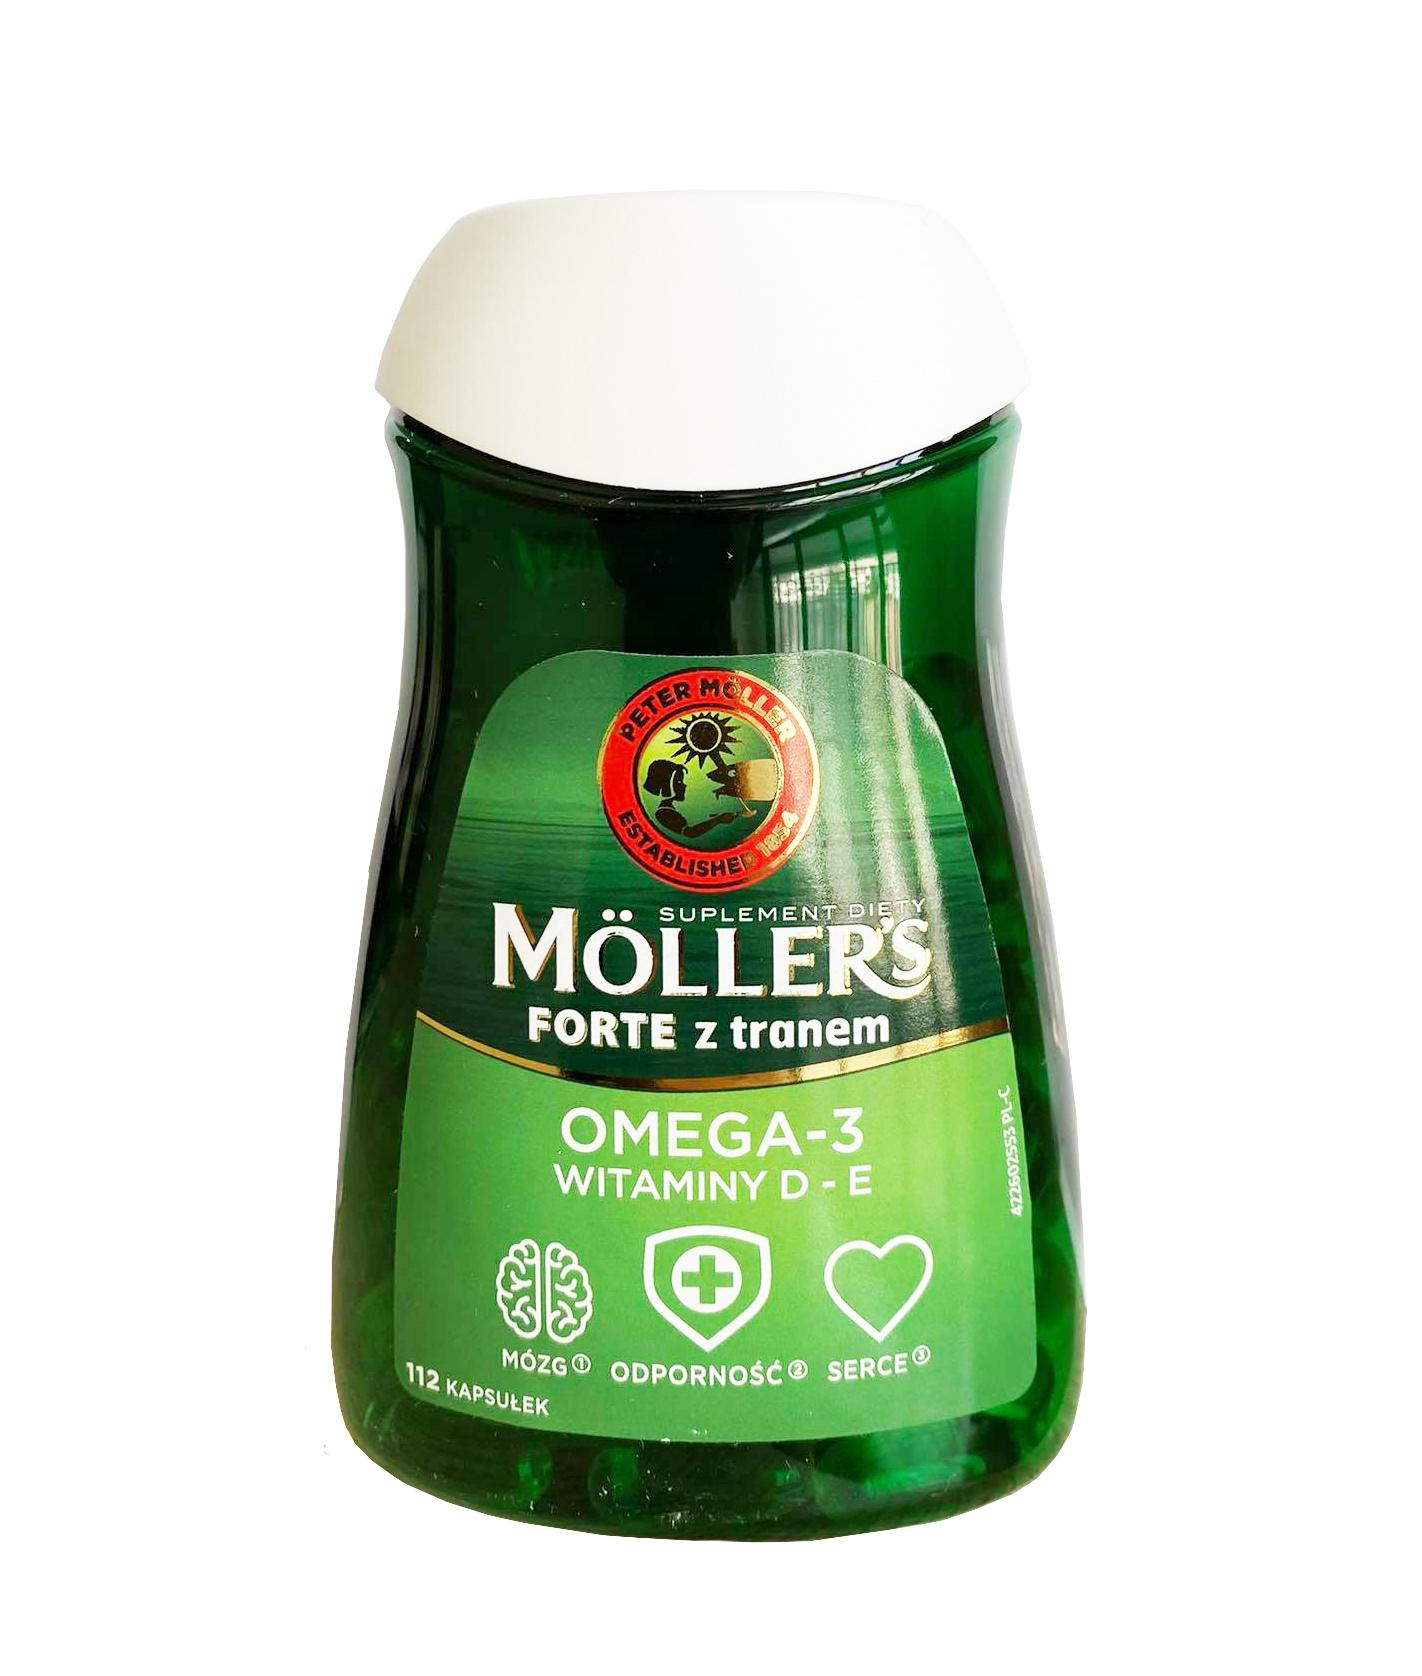 Omega-3 Moller's Dobbel - Bổ sung DHA và EPA mẫu mới